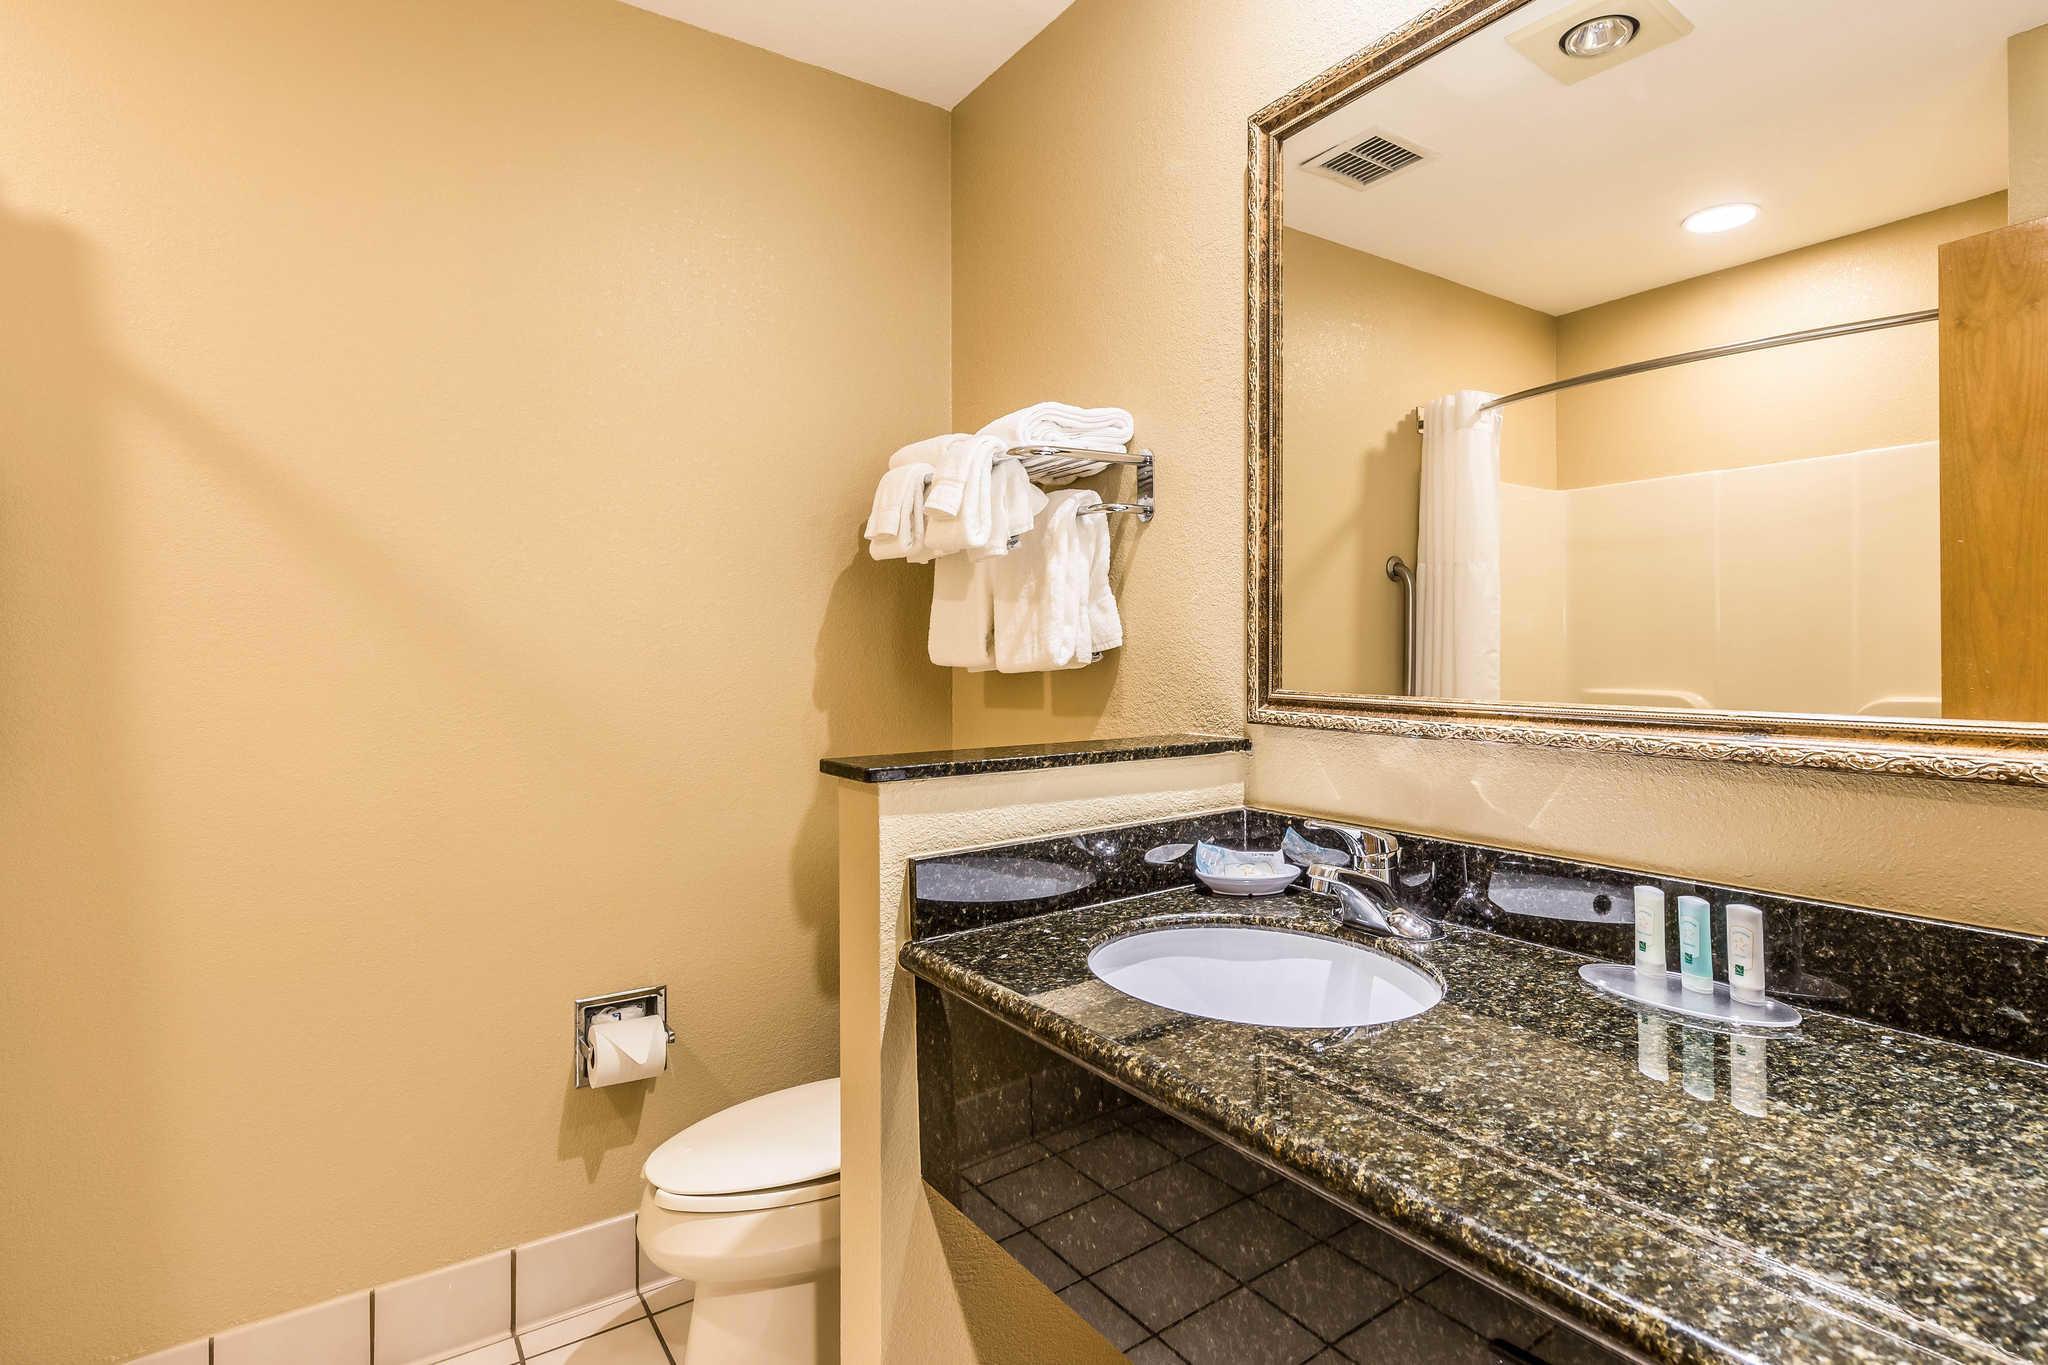 Quality Inn & Suites image 15